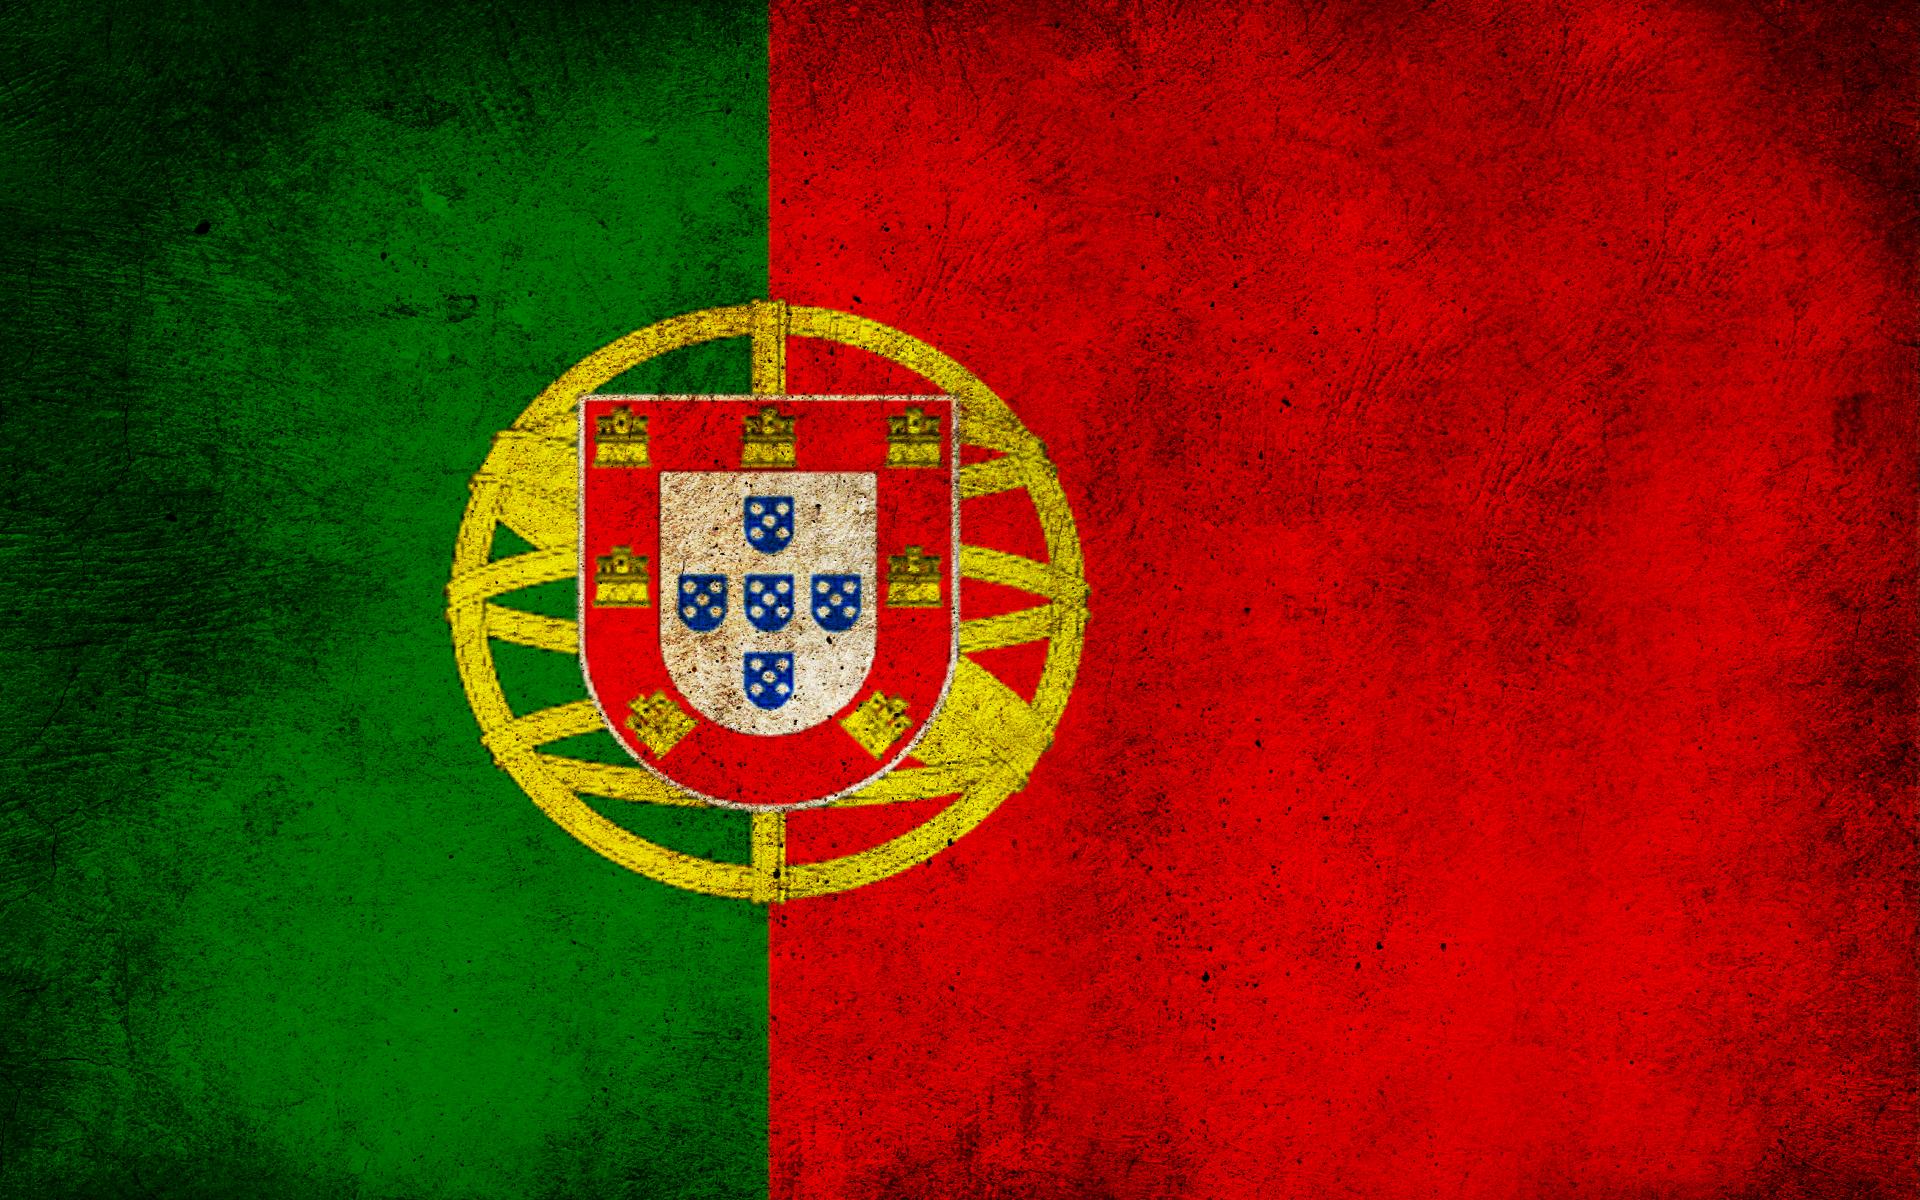 Portugal Flag wallpaper 1920x1200 32879 1920x1200